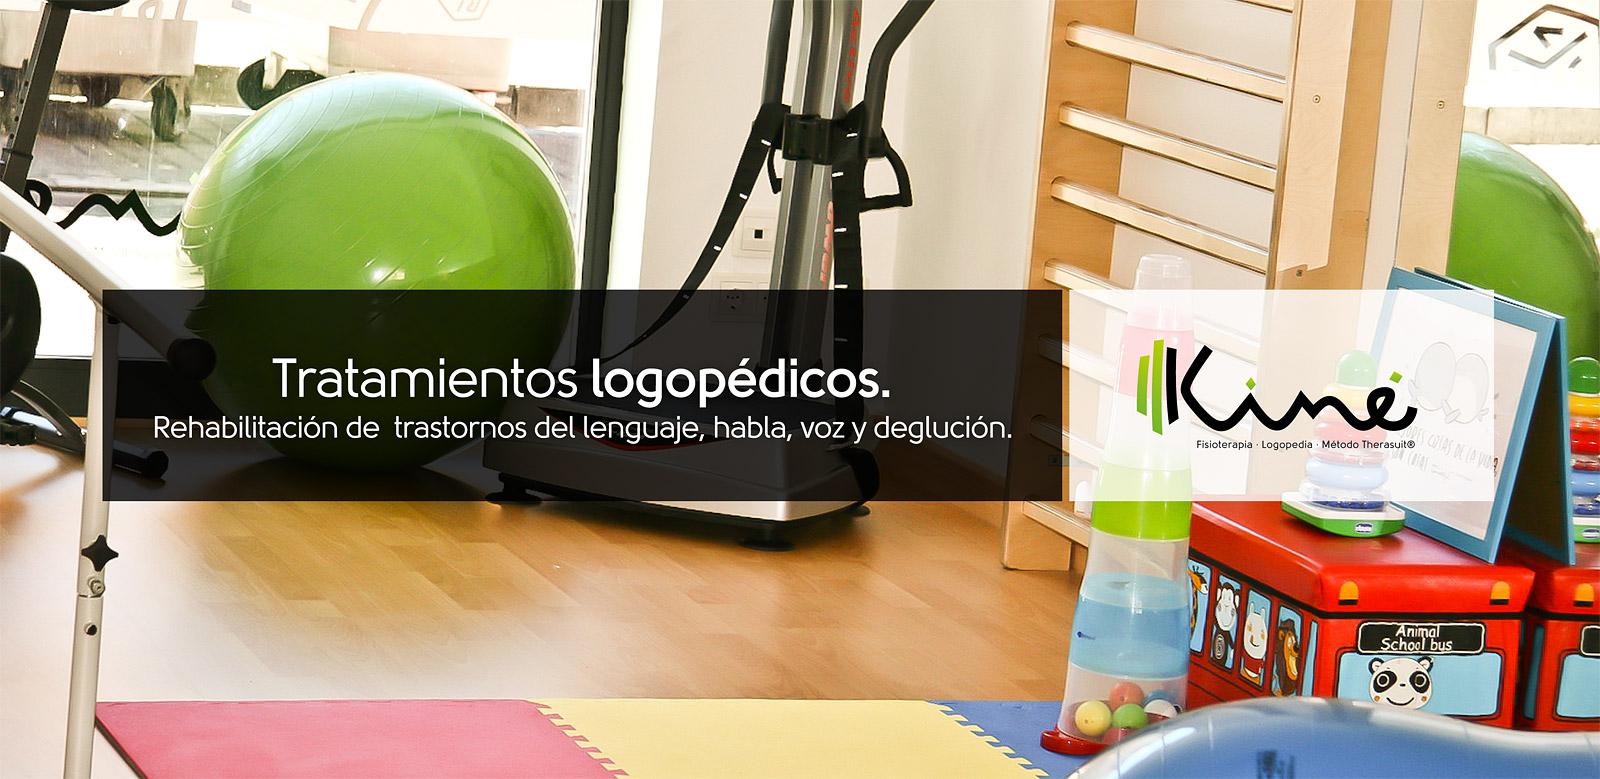 logopedia-slider4-kine-rehabilitacion